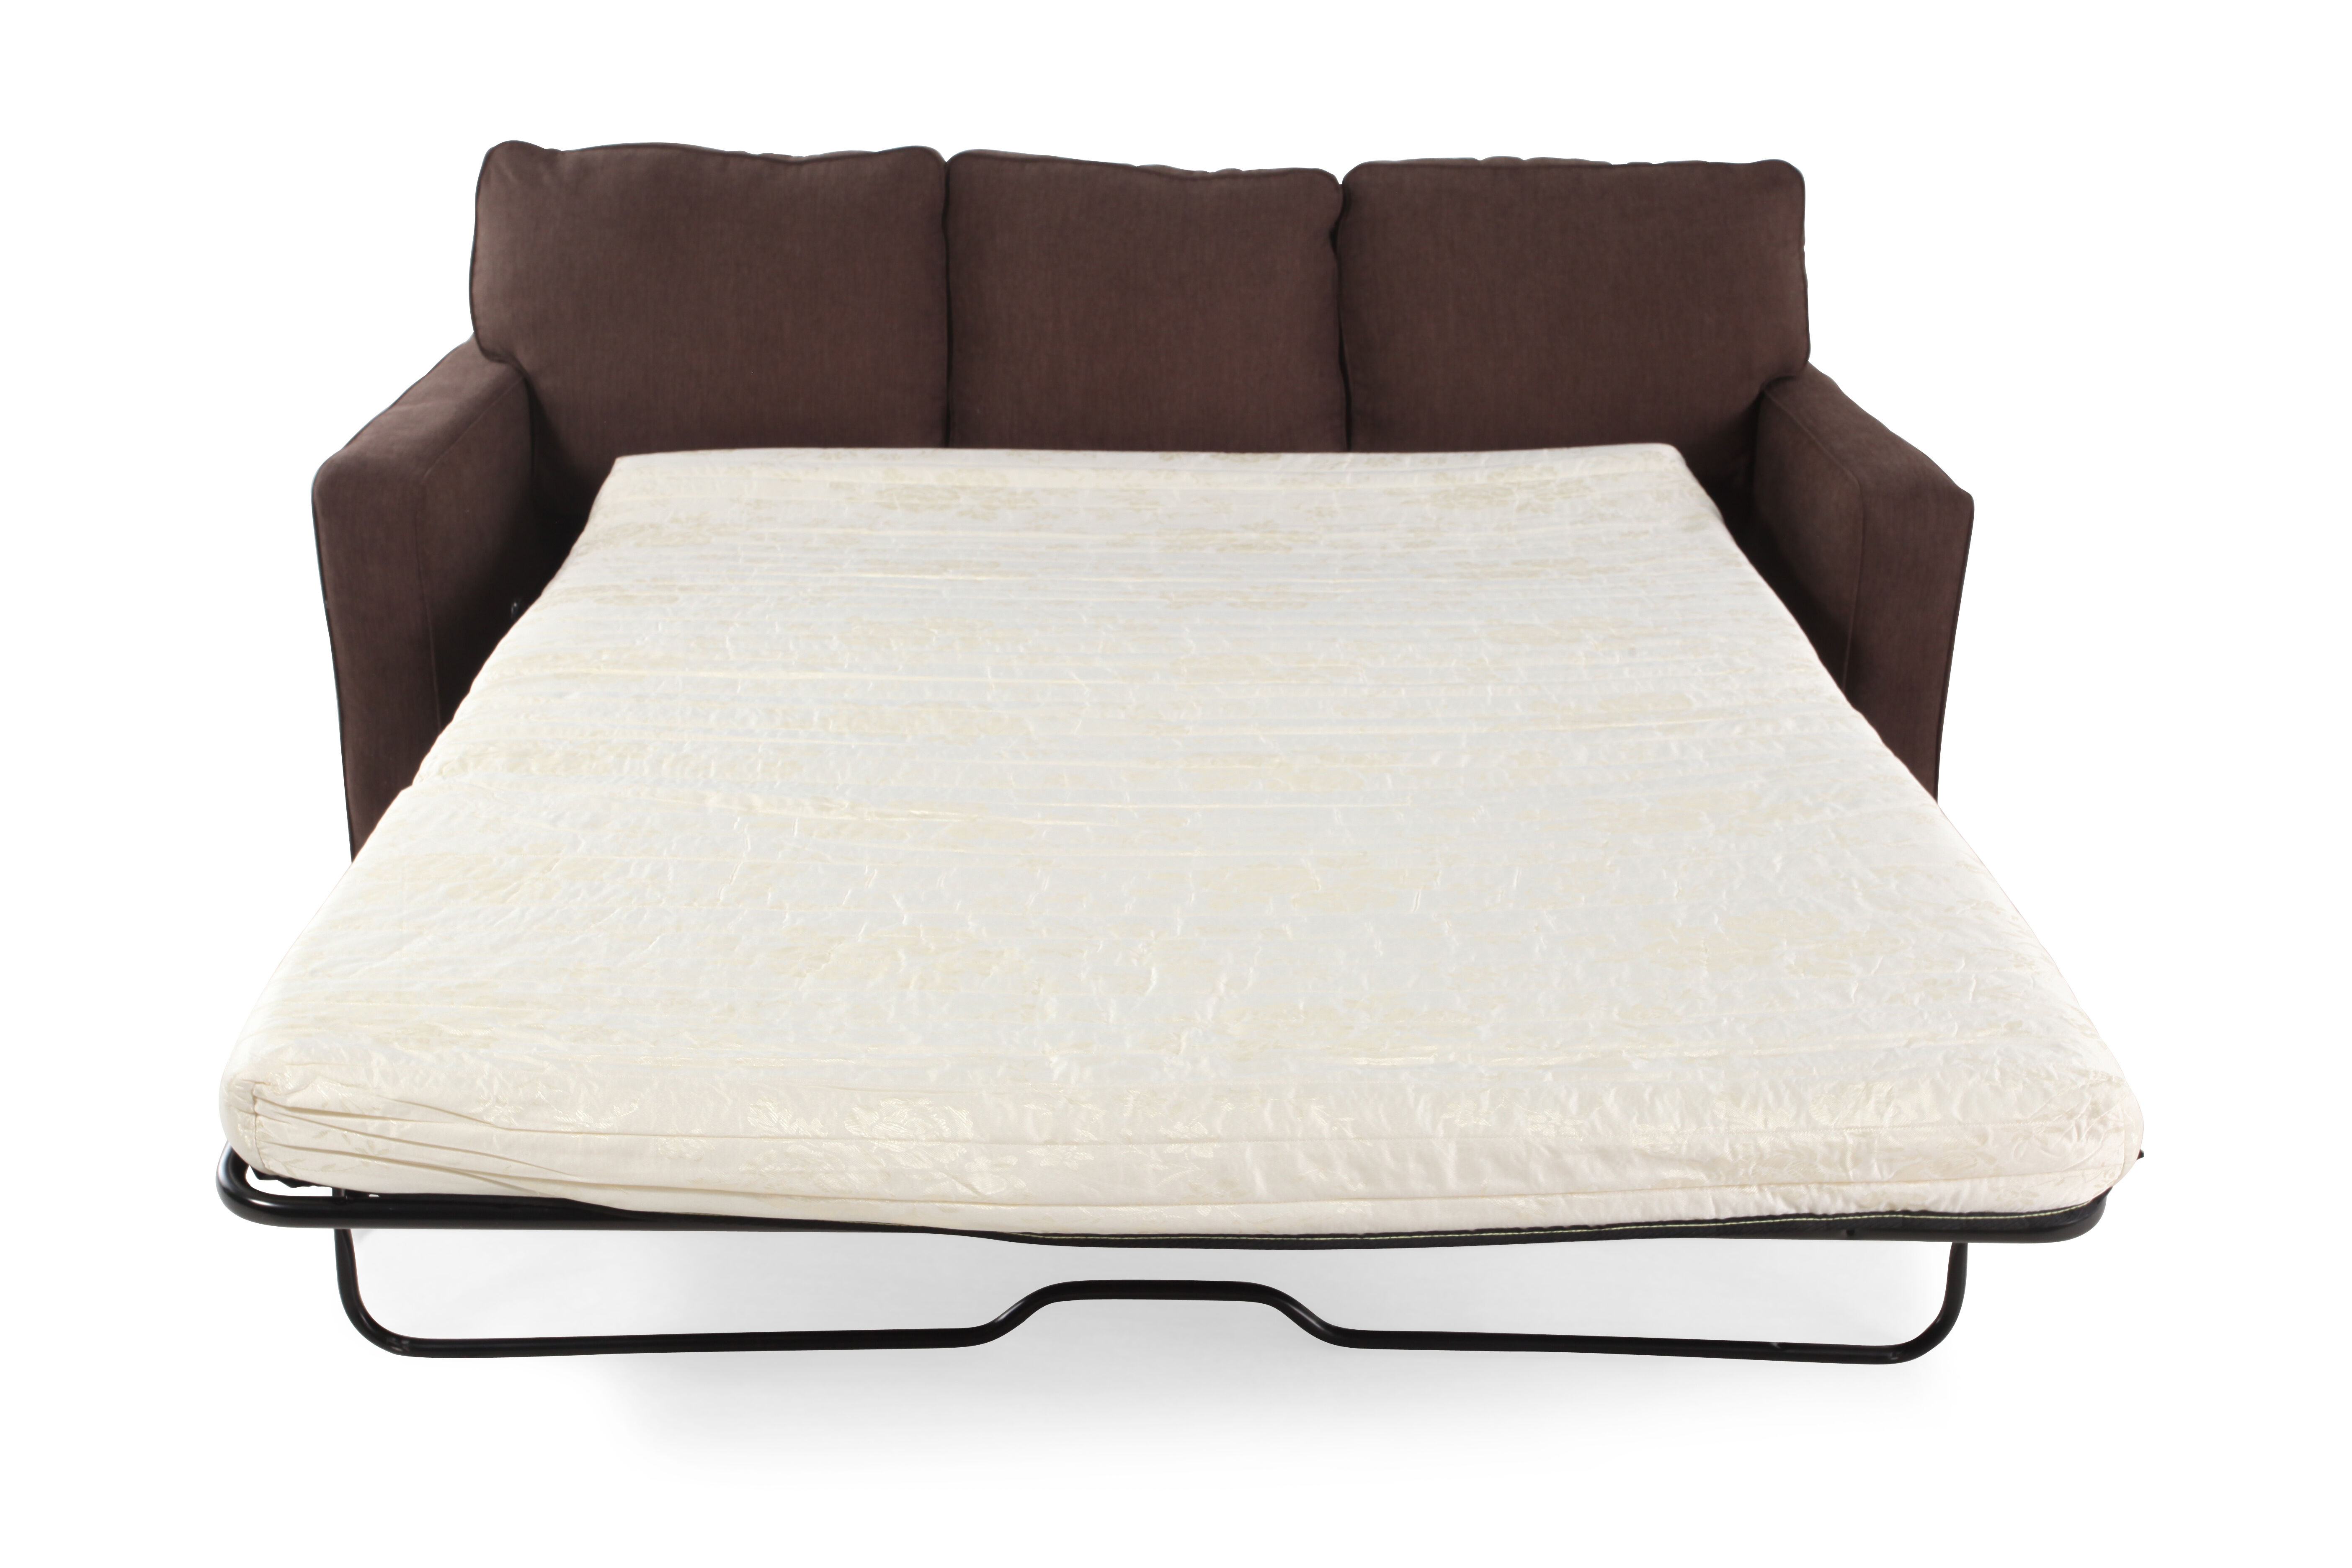 Contemporary 82u0026quot; Queen Sleeper Sofa In Espresso